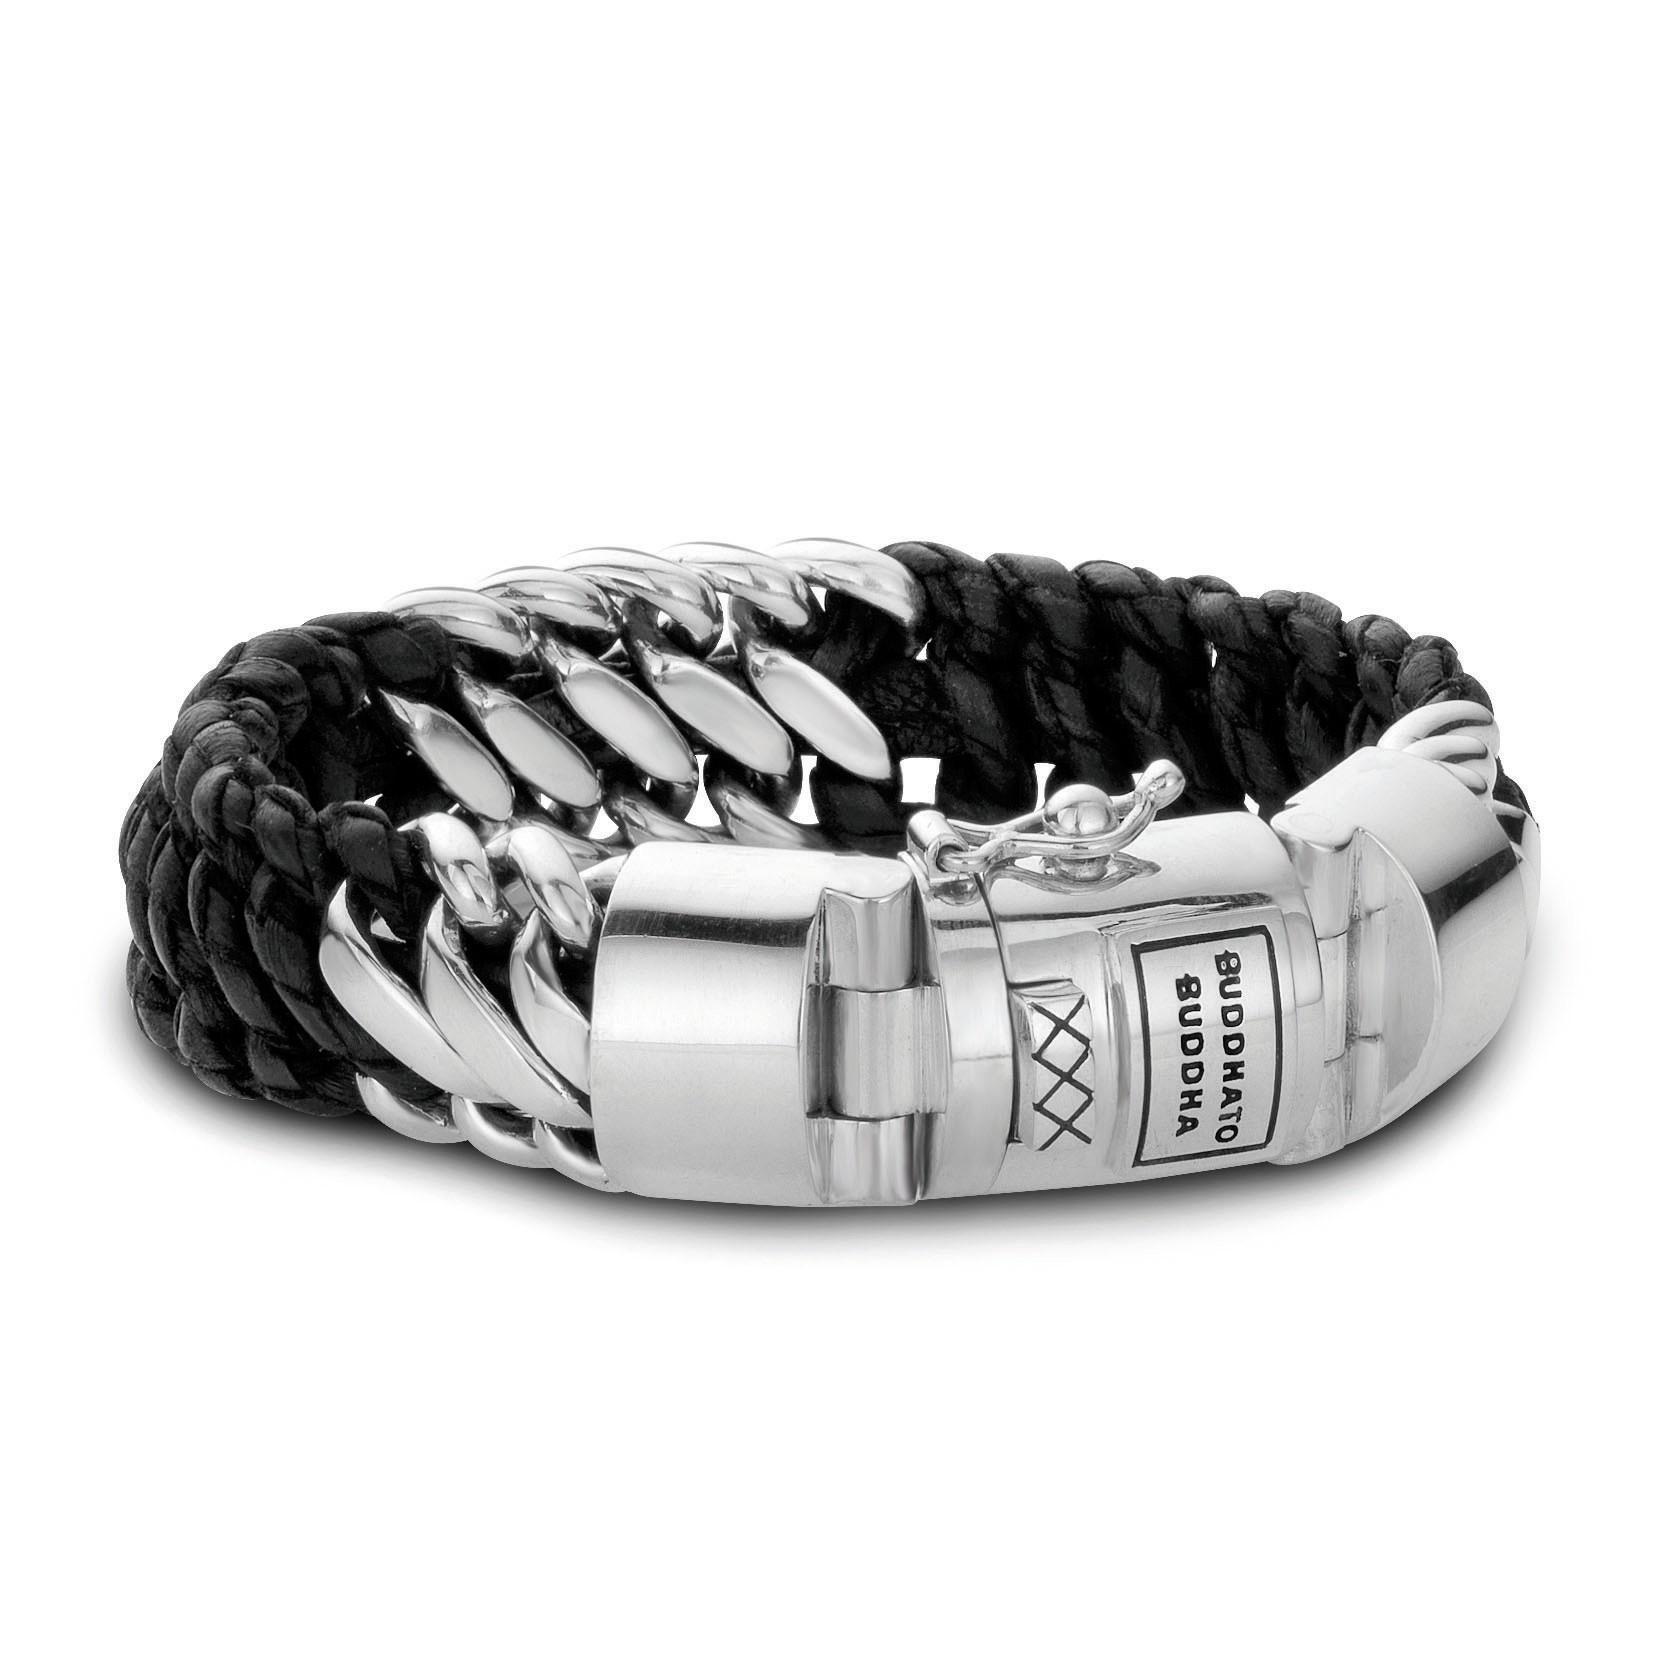 Ben Mix /Leather Bracelet Black-1